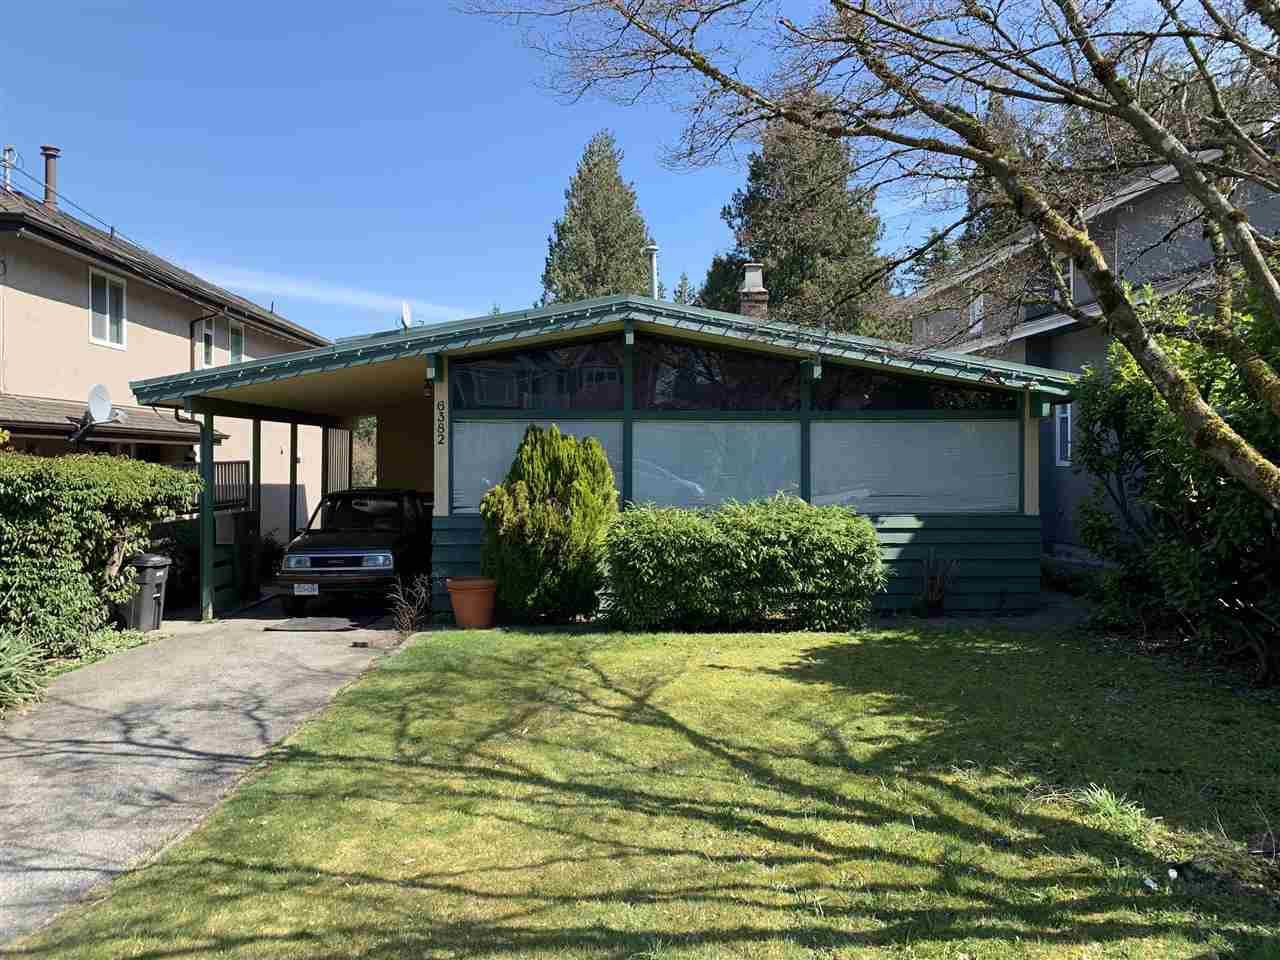 Main Photo: 6382 MALVERN Avenue in Burnaby: Buckingham Heights House for sale (Burnaby South)  : MLS®# R2353339